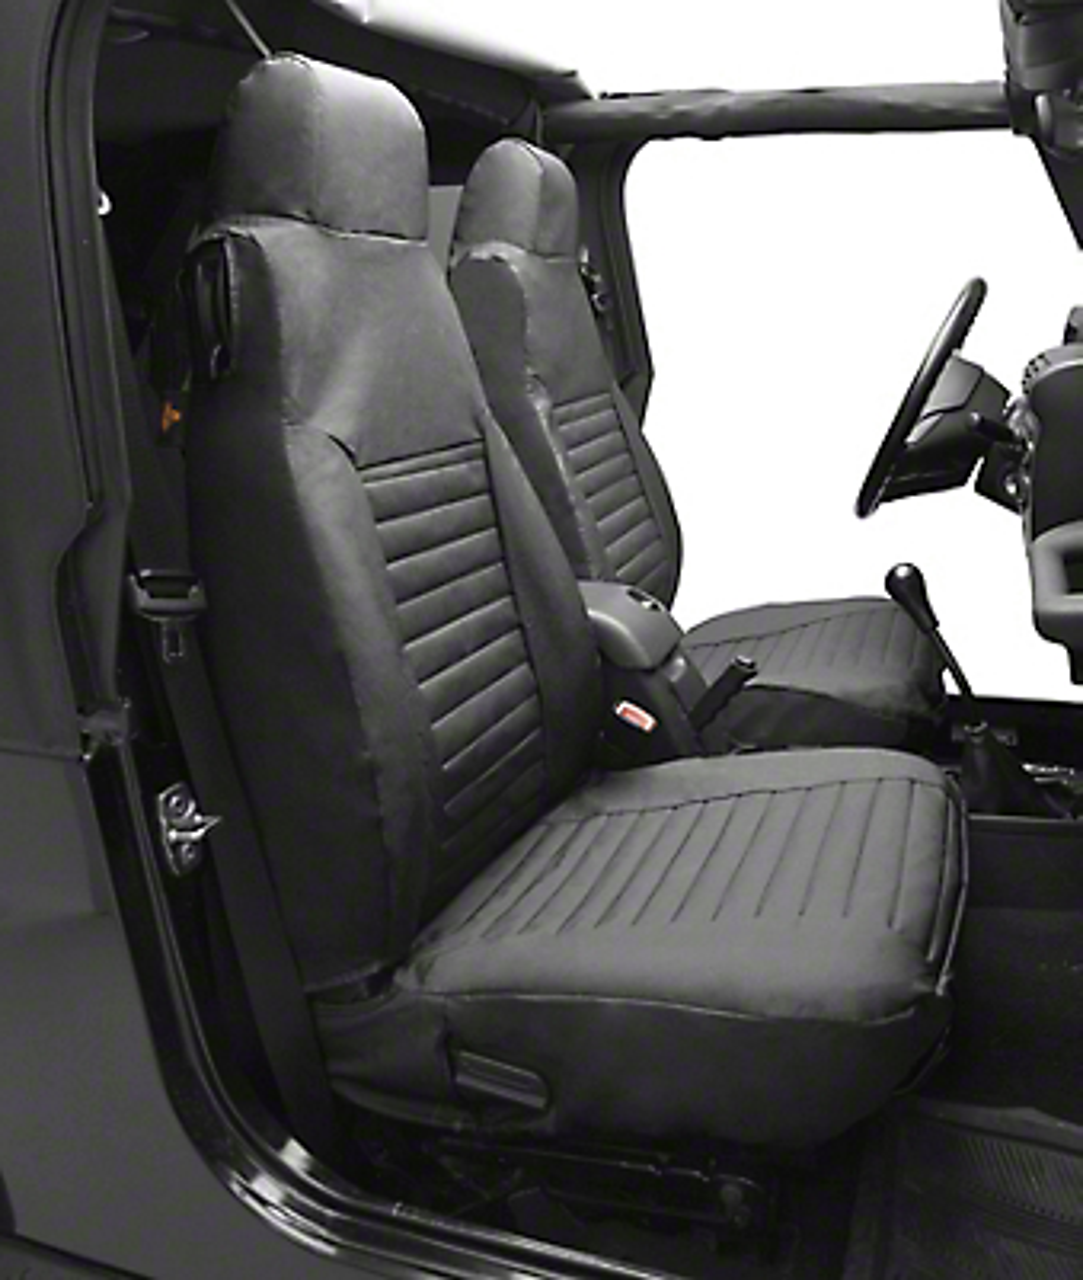 Bestop Front High-Back Seat Covers - Tan (87-90 Wrangler YJ)